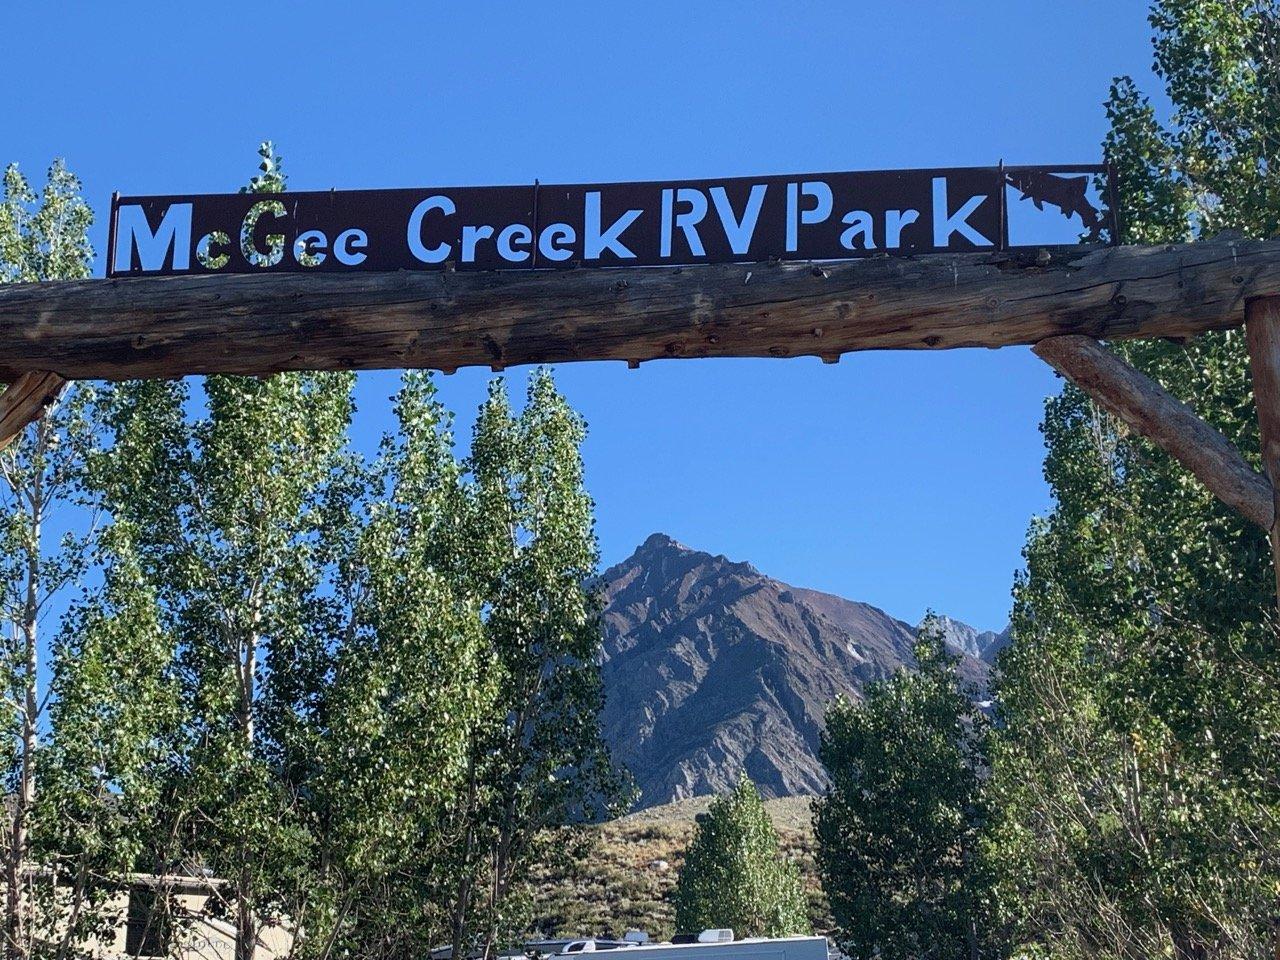 McGee Creek RV Park entrance